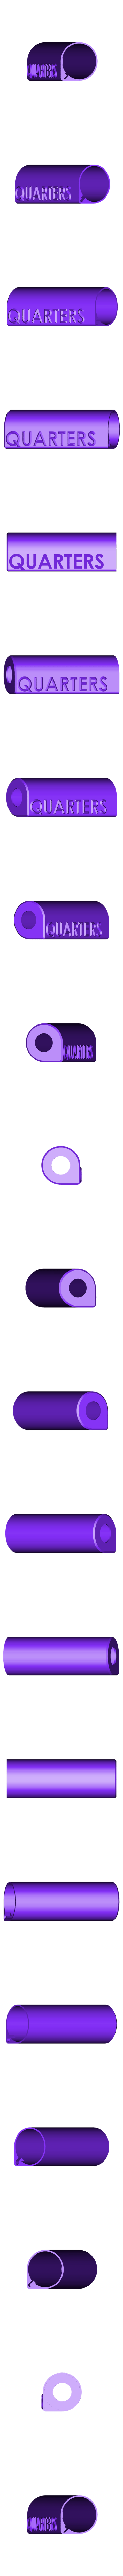 Quarter Roll.stl Download free STL file Coin Rolls • Design to 3D print, Hom3d